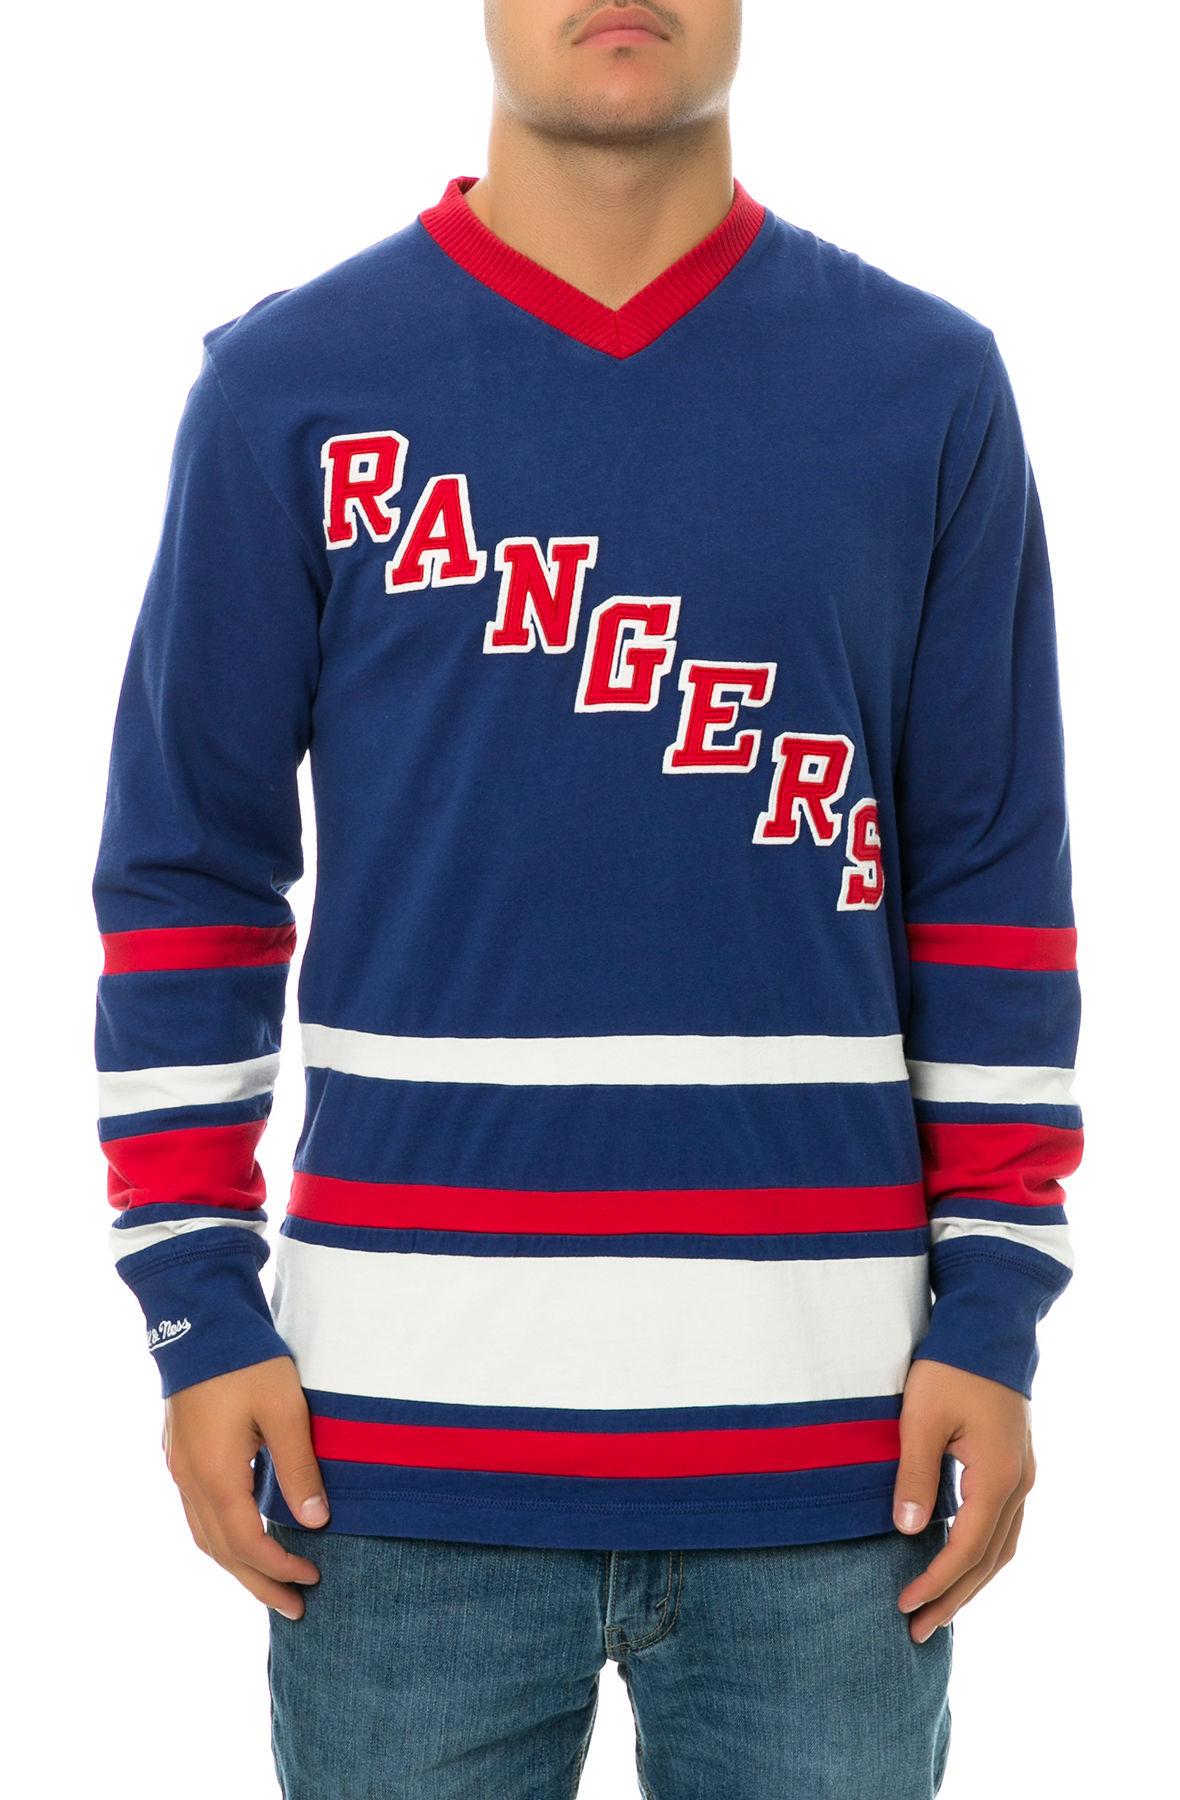 super popular 2c101 89c16 sale new york rangers hockey jersey 58269 8ed04